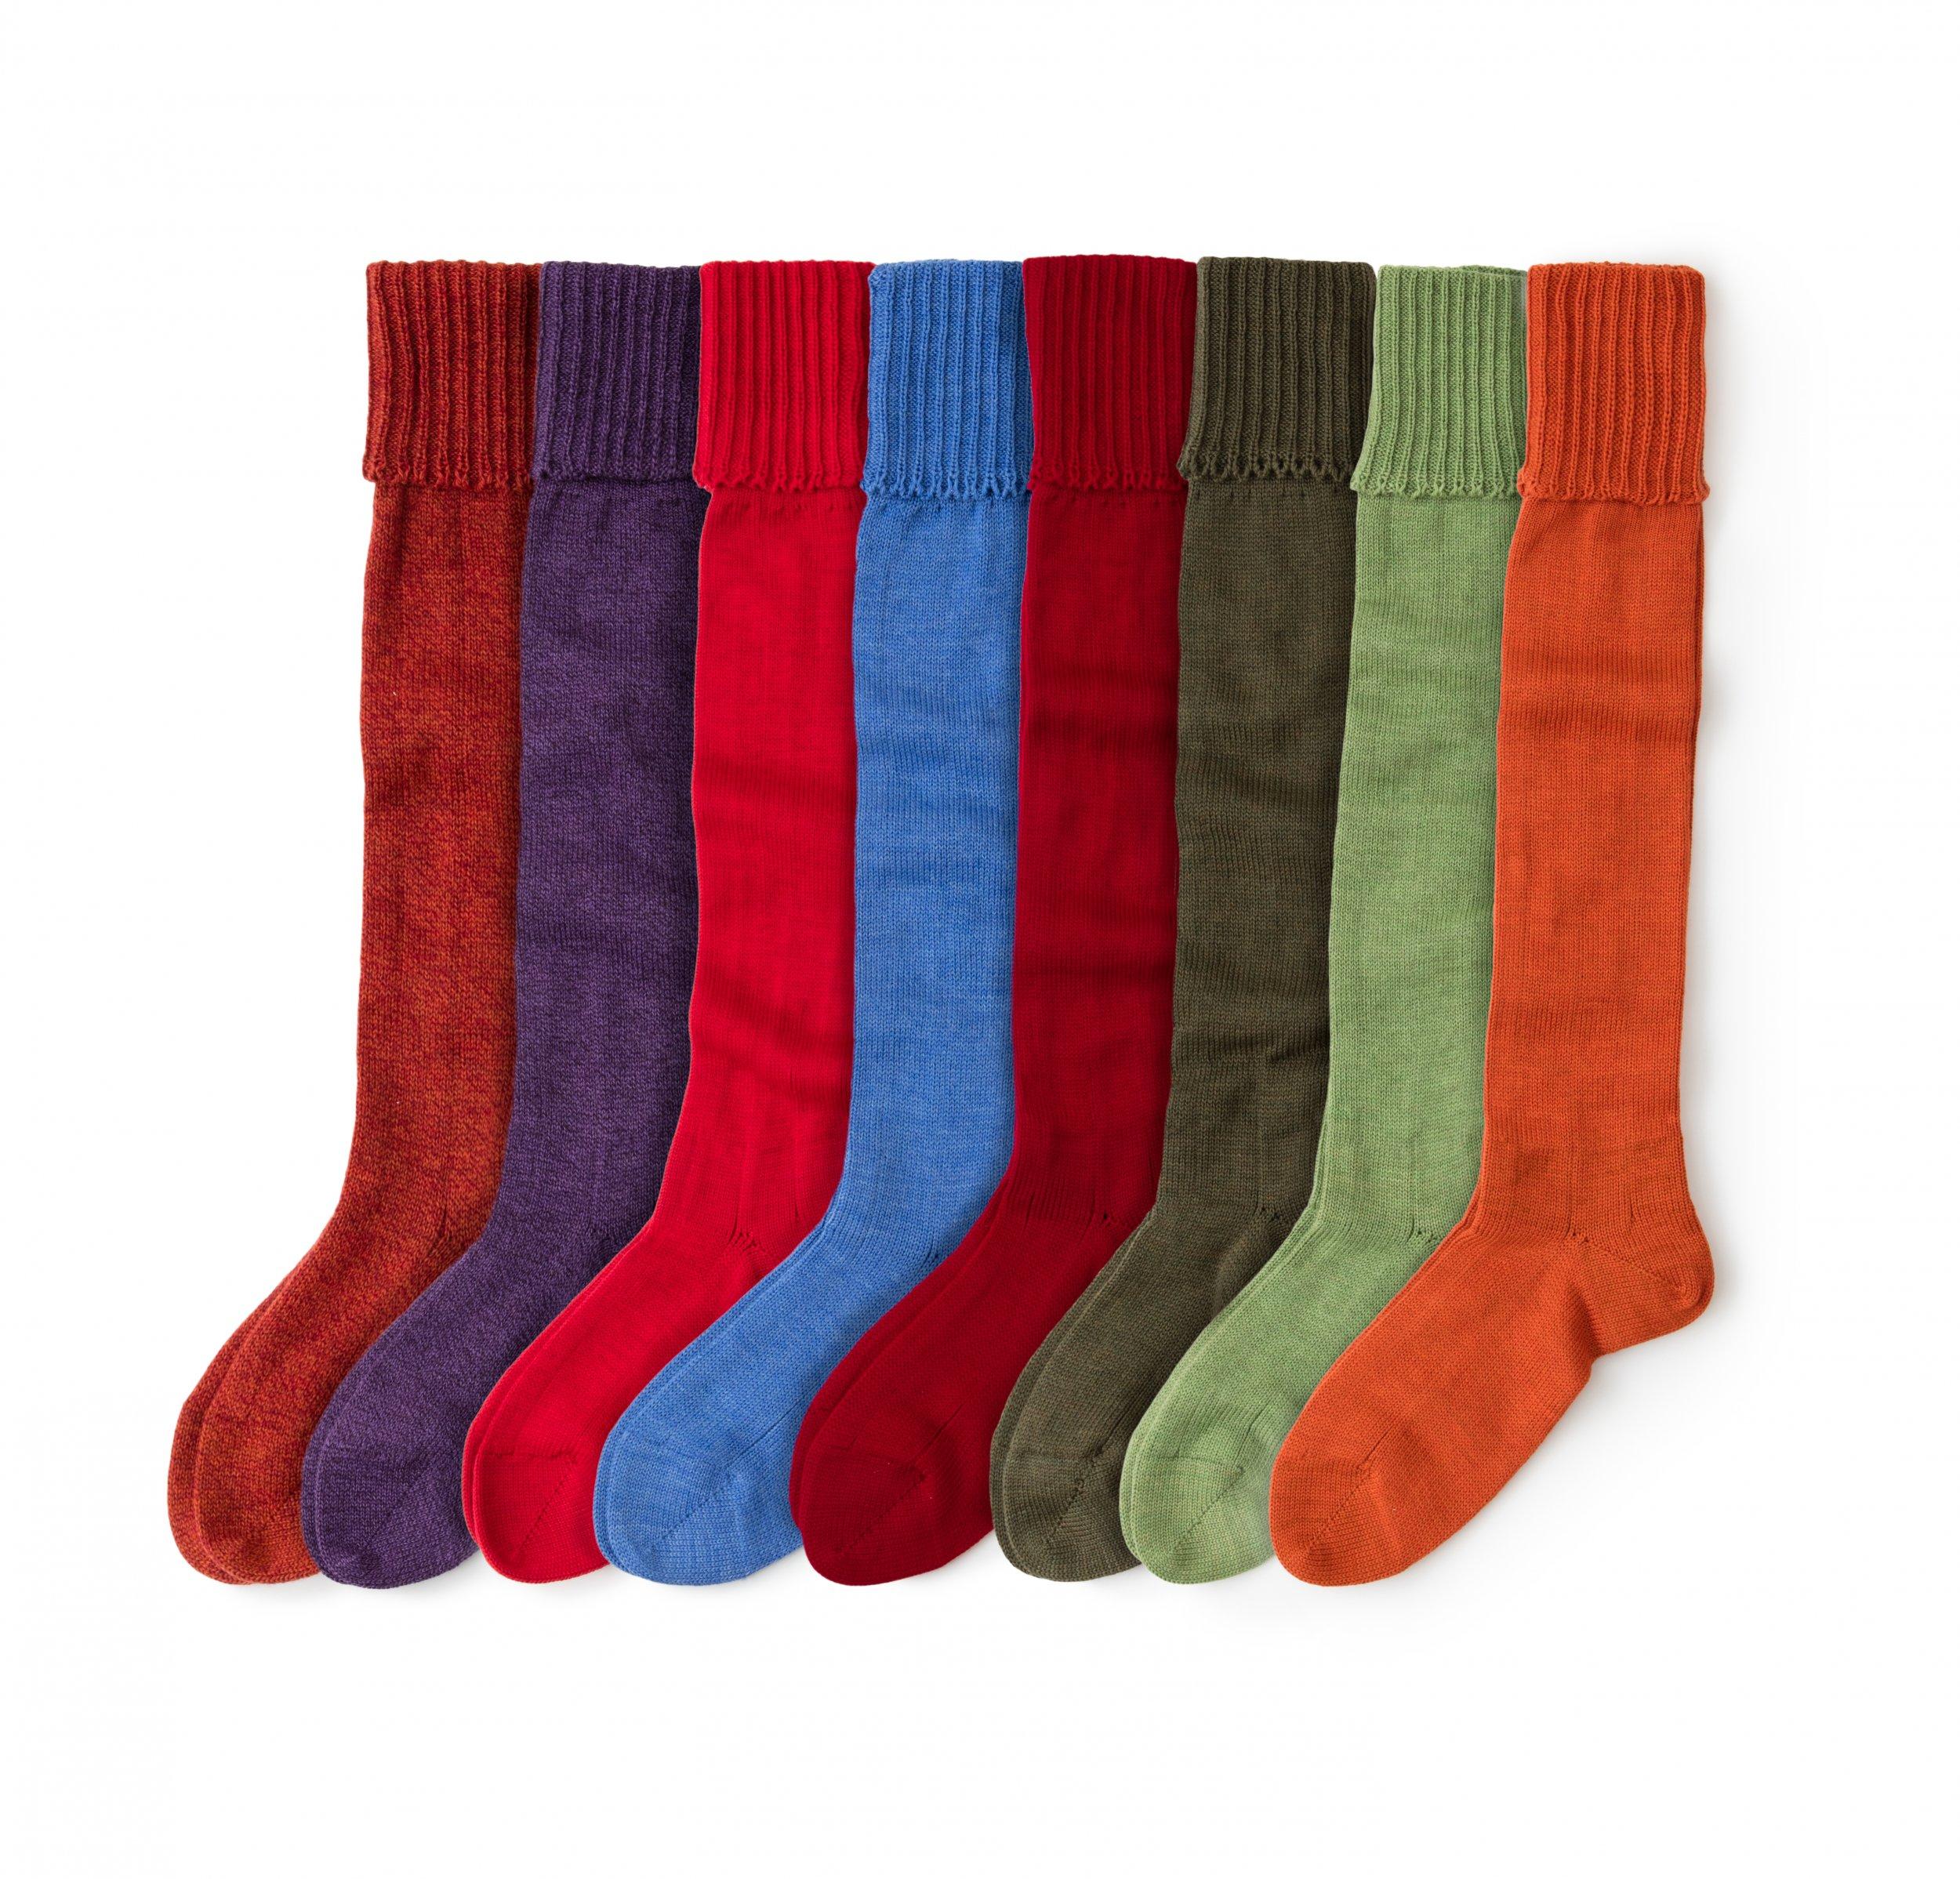 10_07_Socks_01